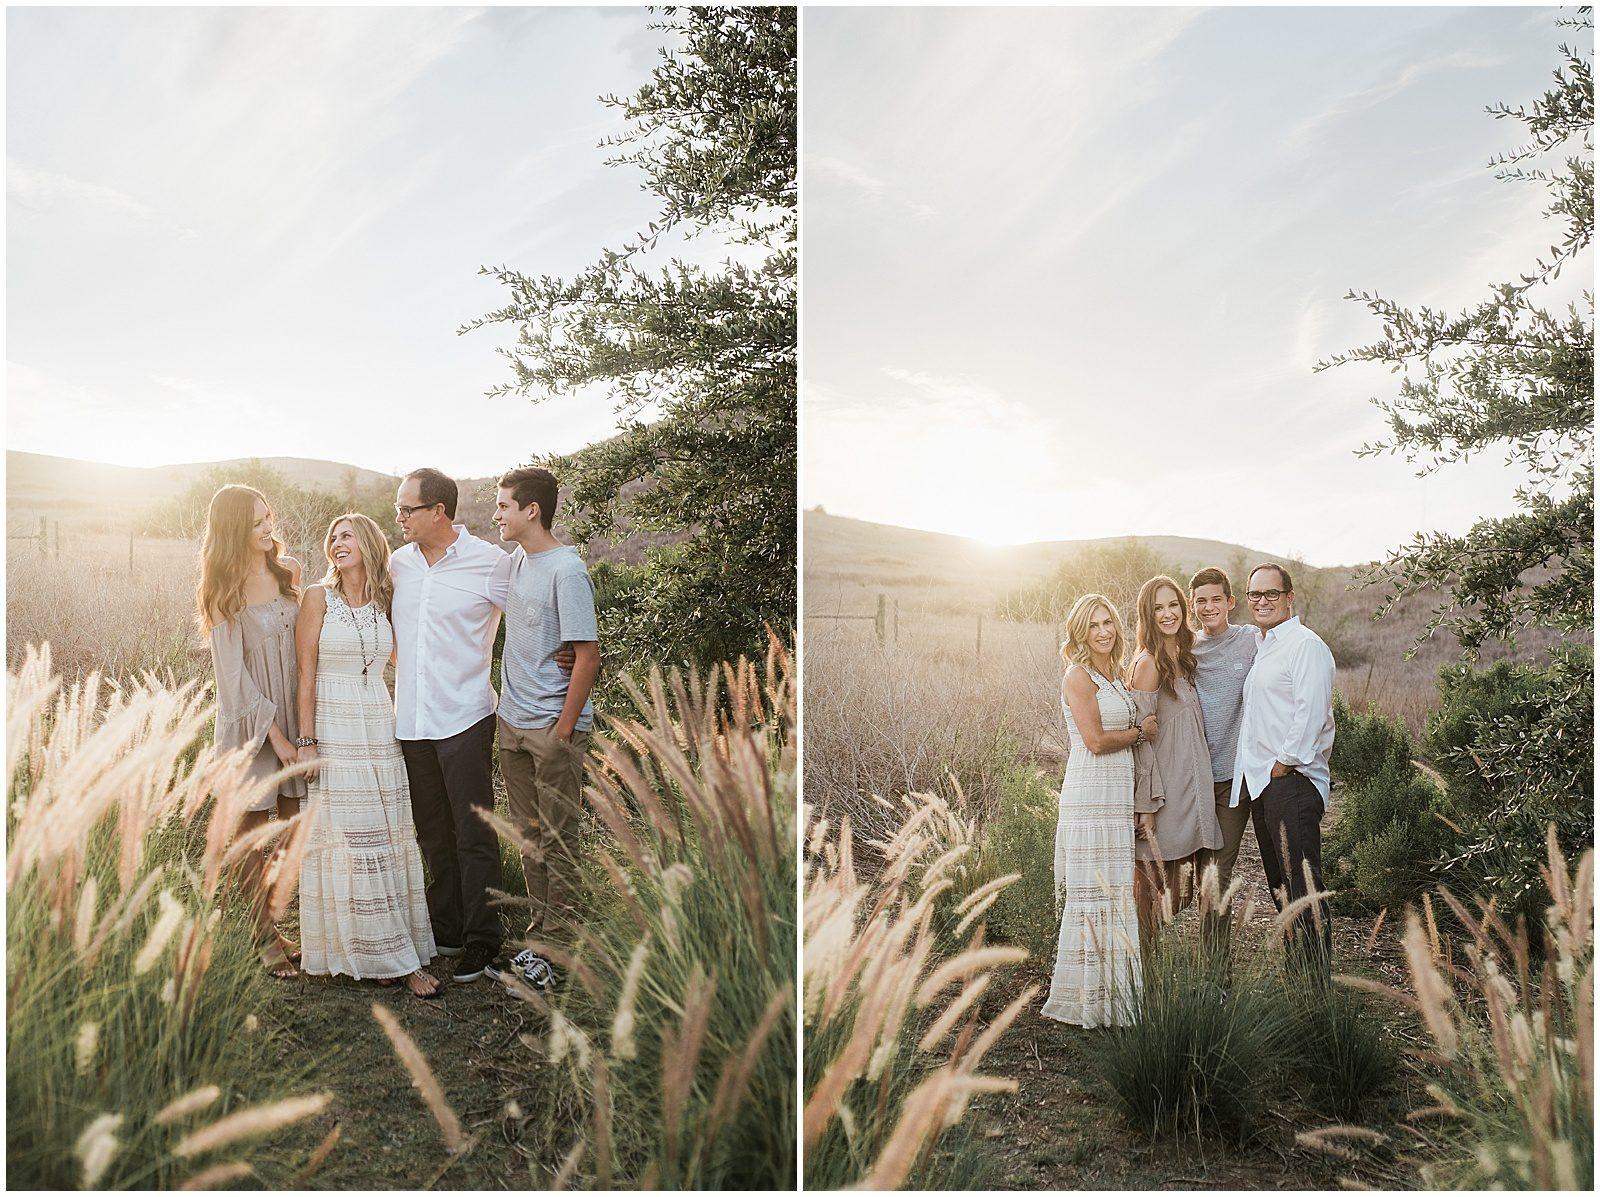 Orange County Family Photographer Sonja Hammad Photography 0111